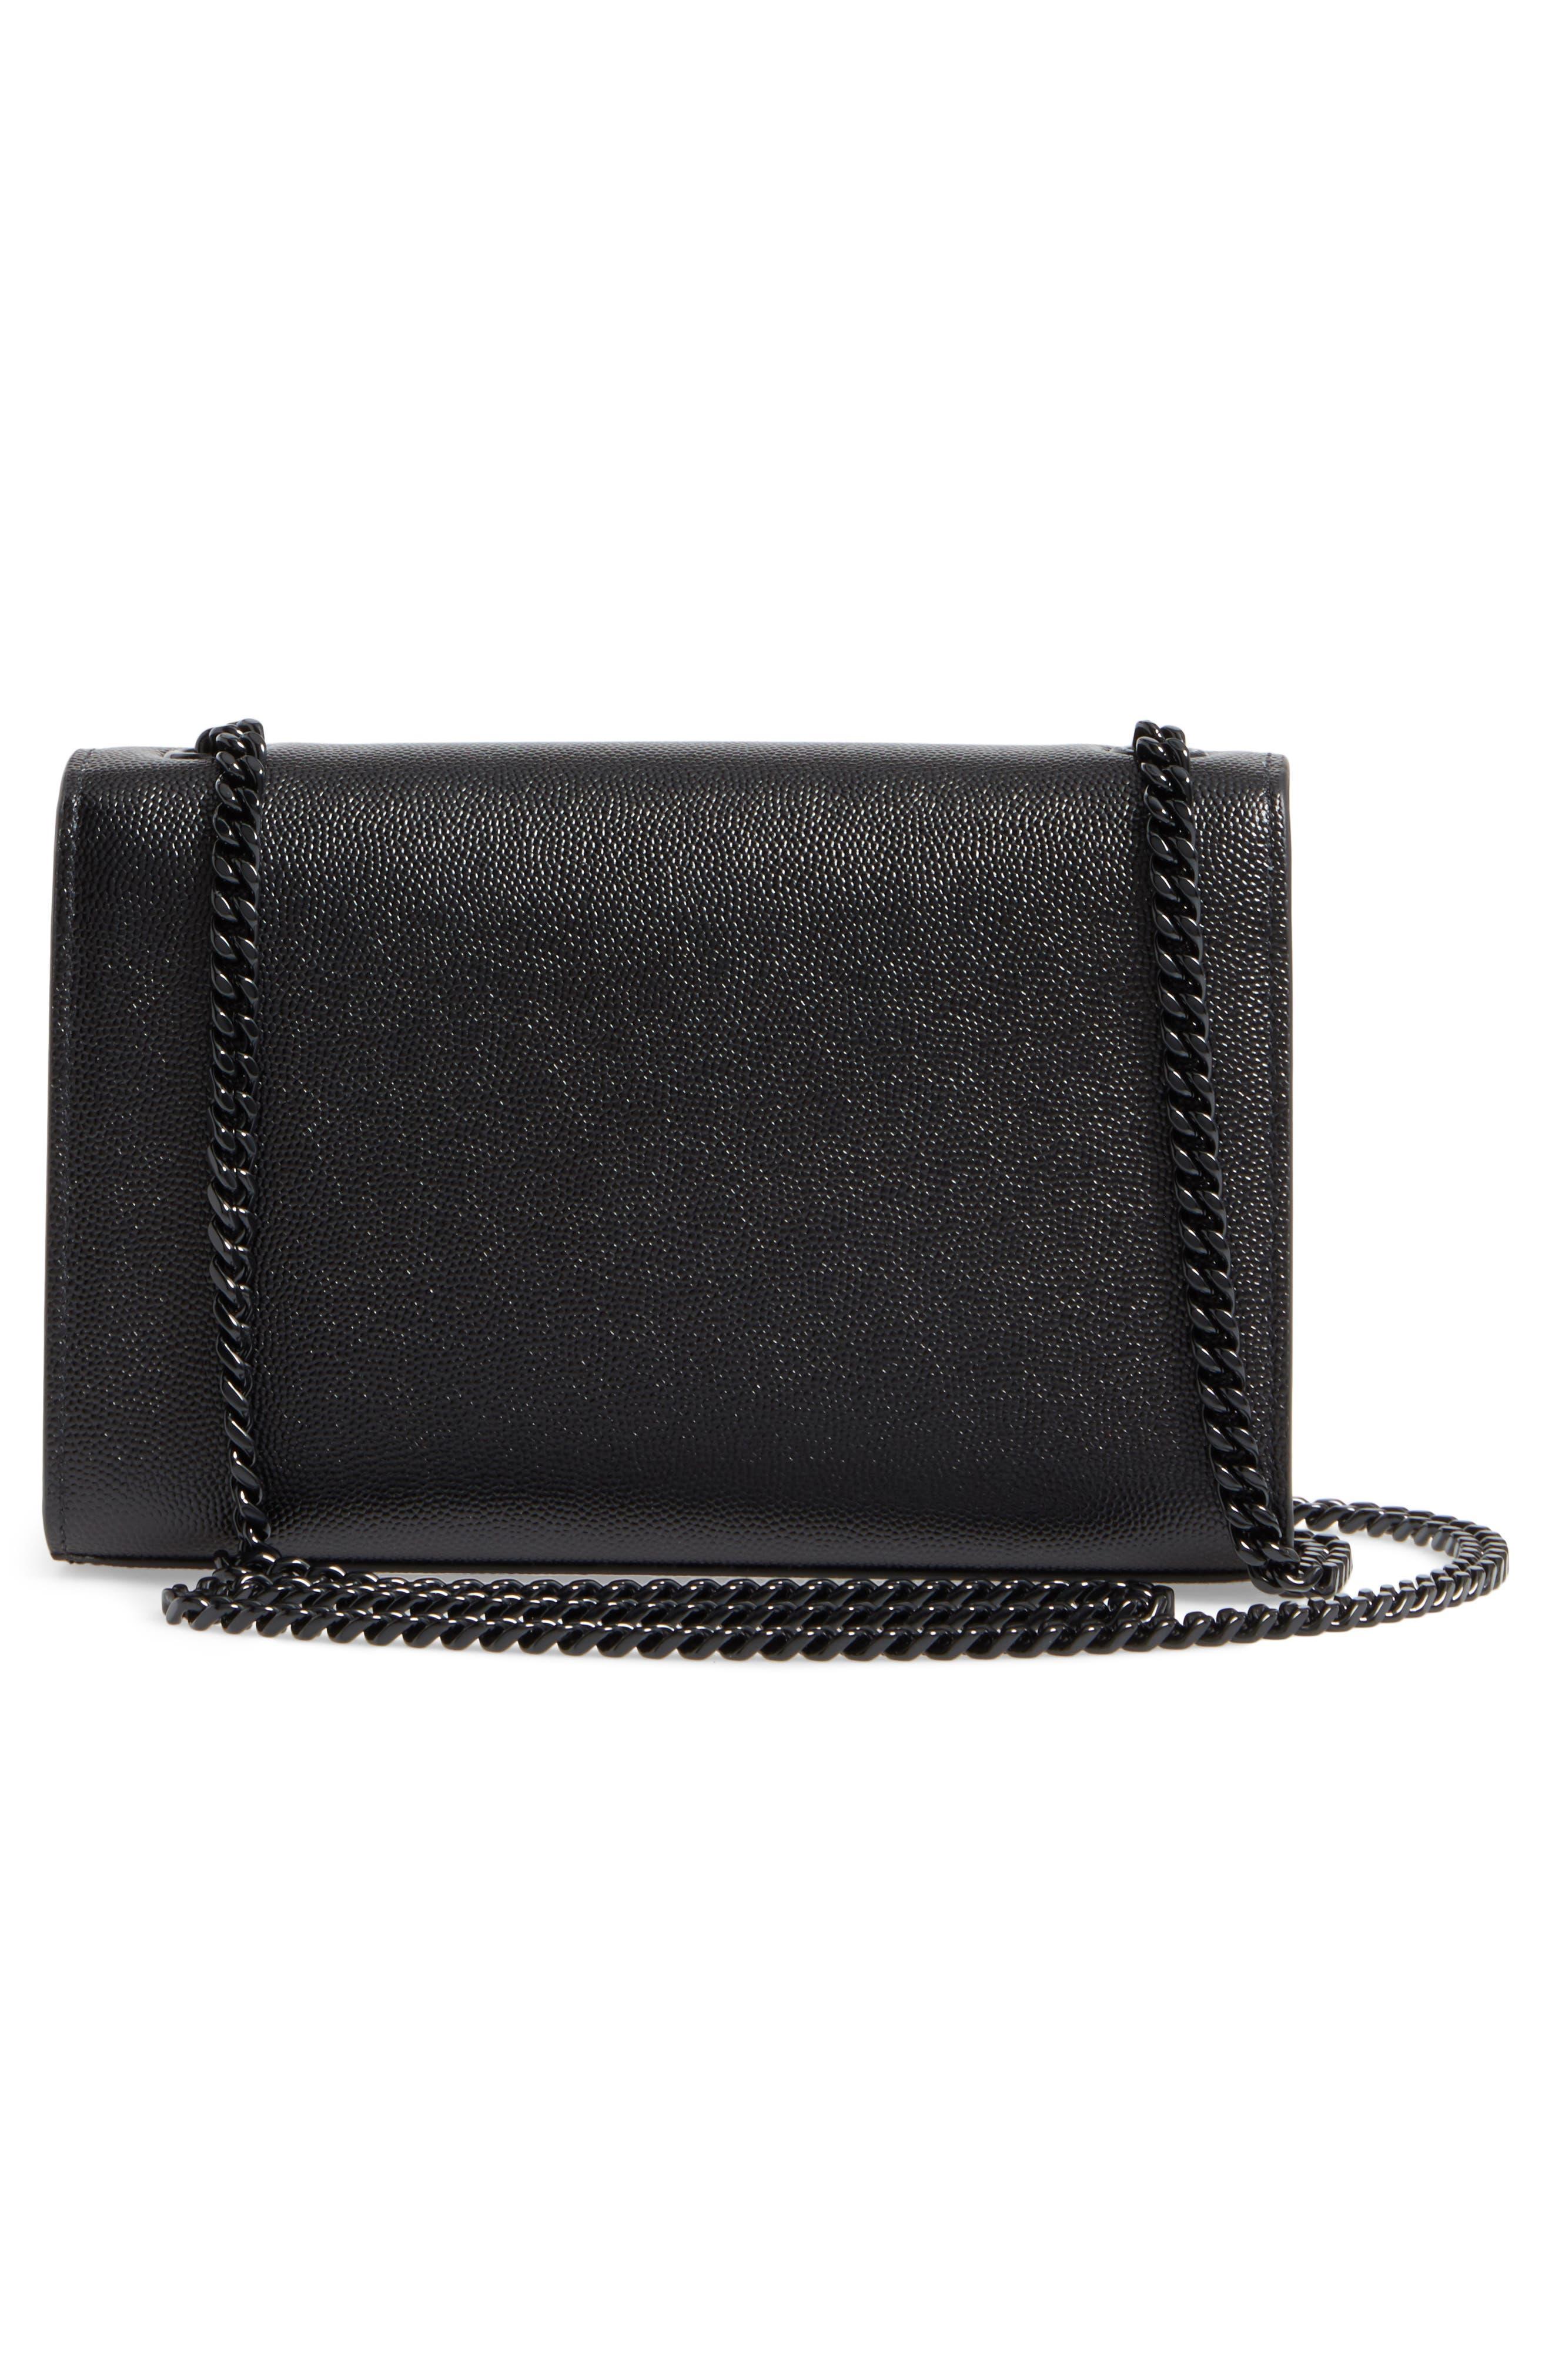 SAINT LAURENT, Small Kate Leather Shoulder Bag, Alternate thumbnail 4, color, BLACK